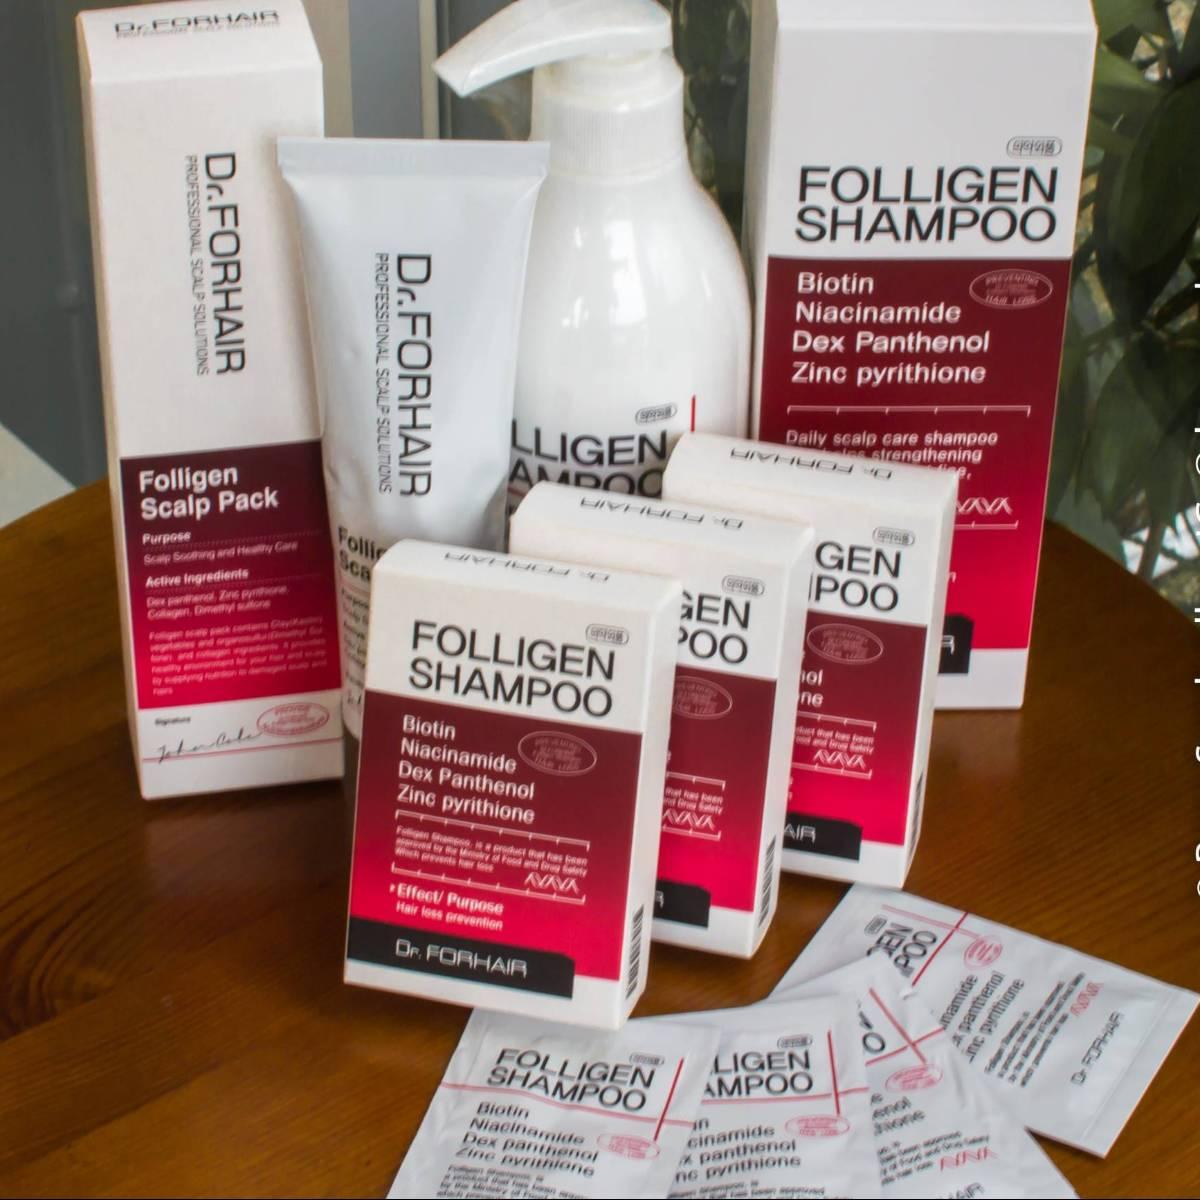 Shampo Korea - Dr.forhair Folligen Shampoo & Folligen Scalp Pack